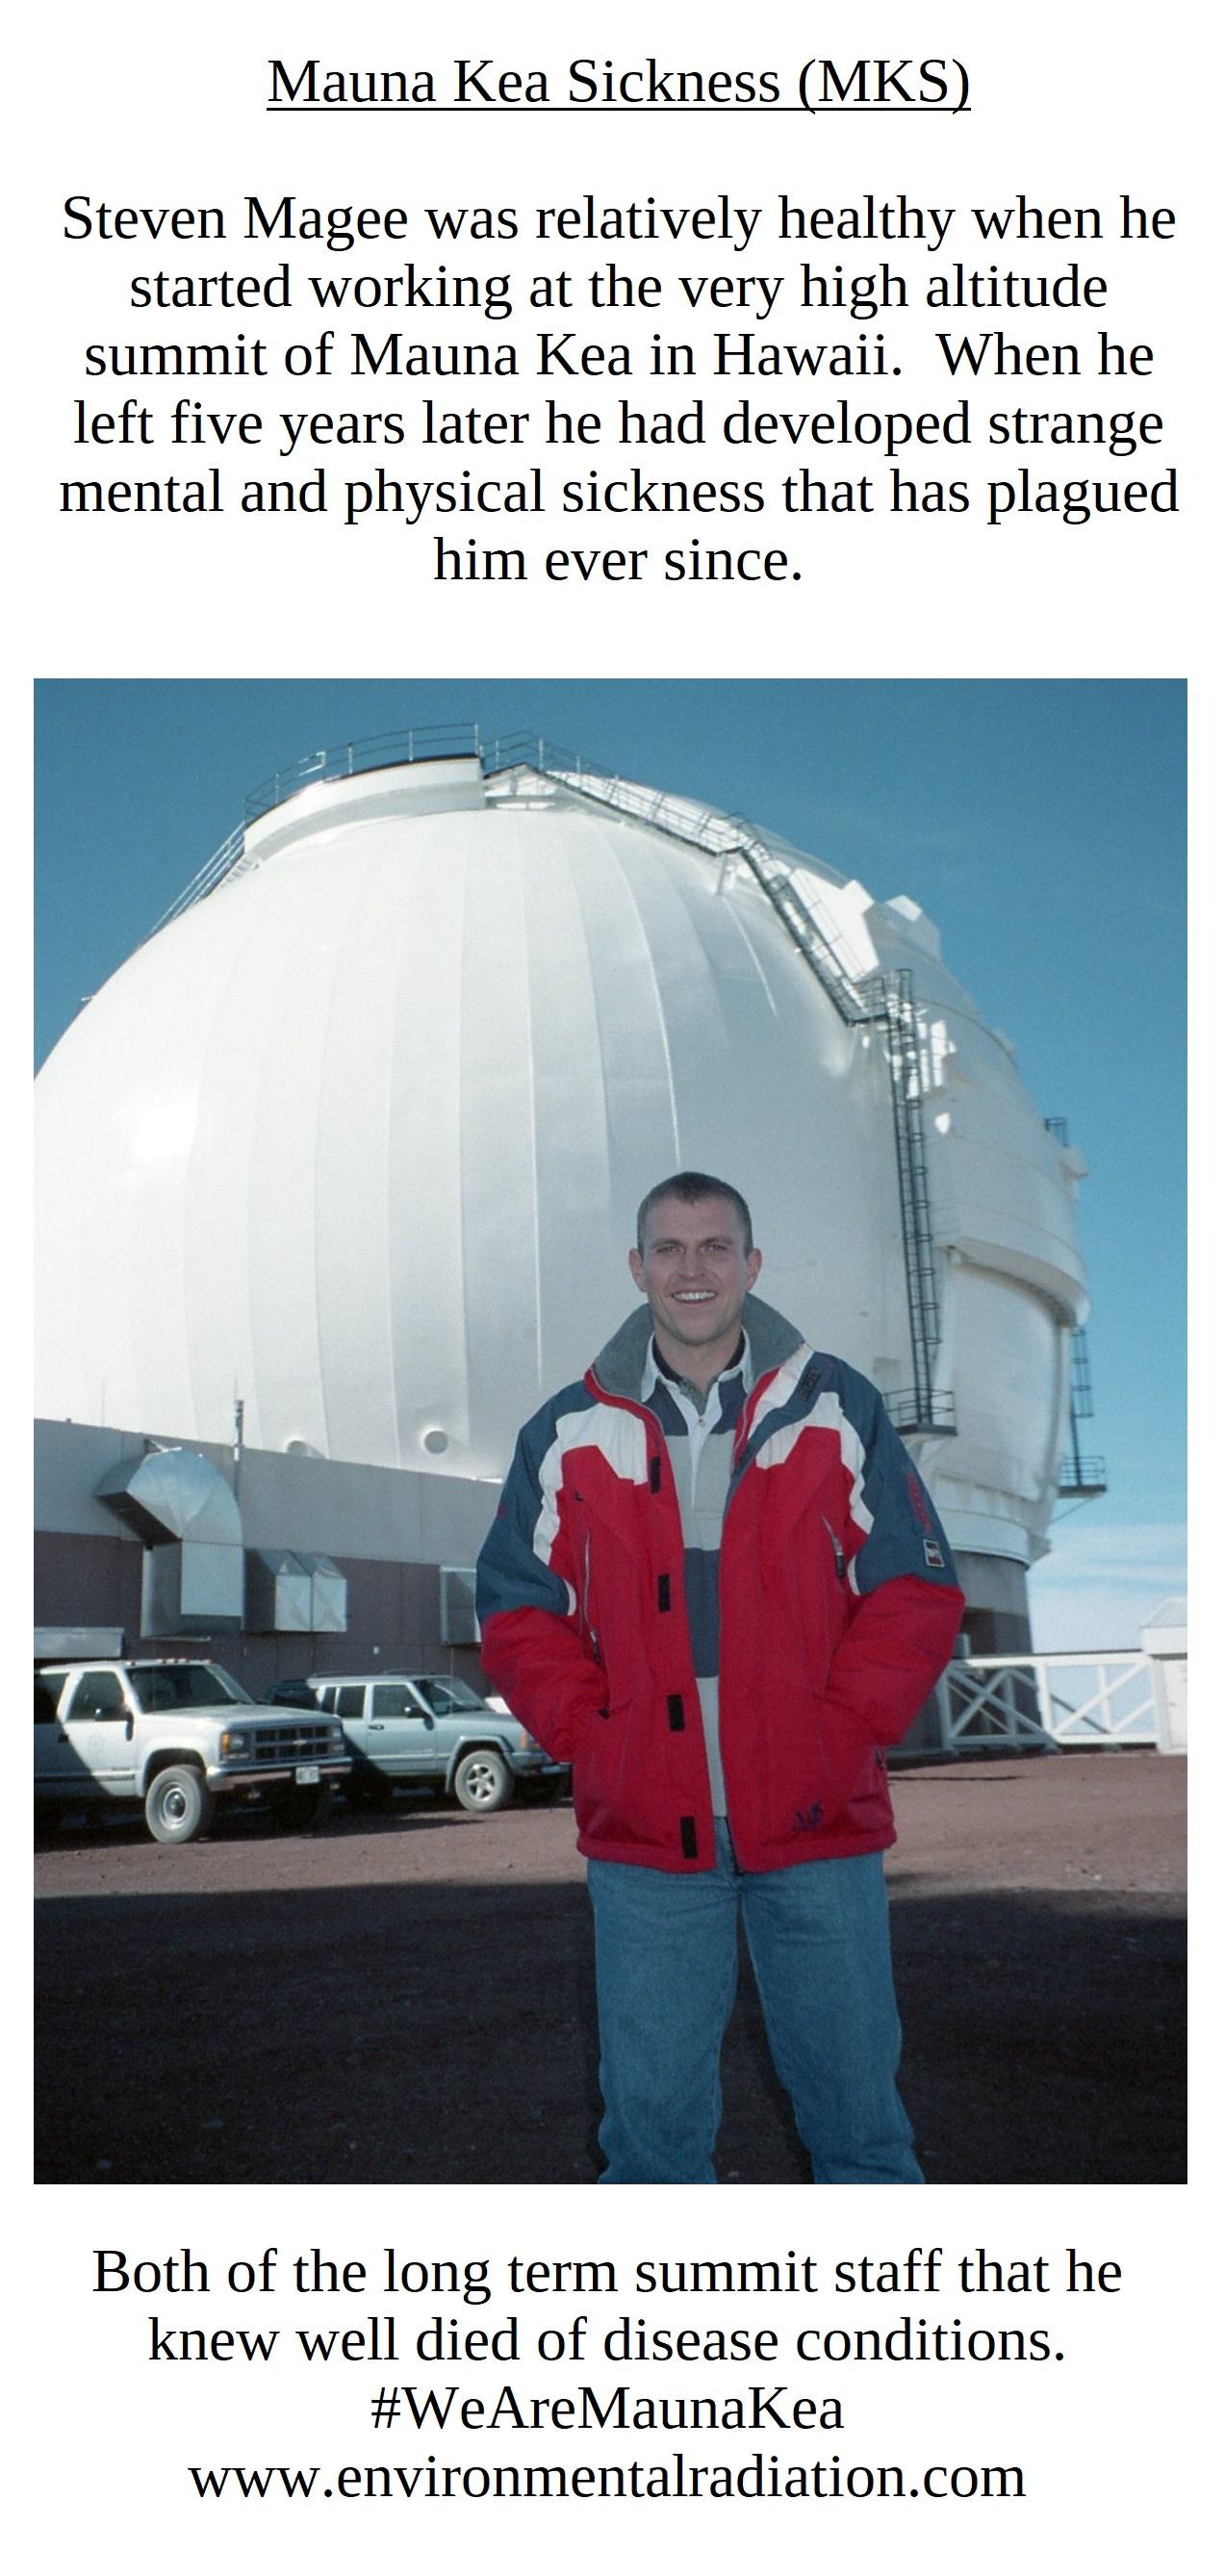 Environmental Radiation LLC